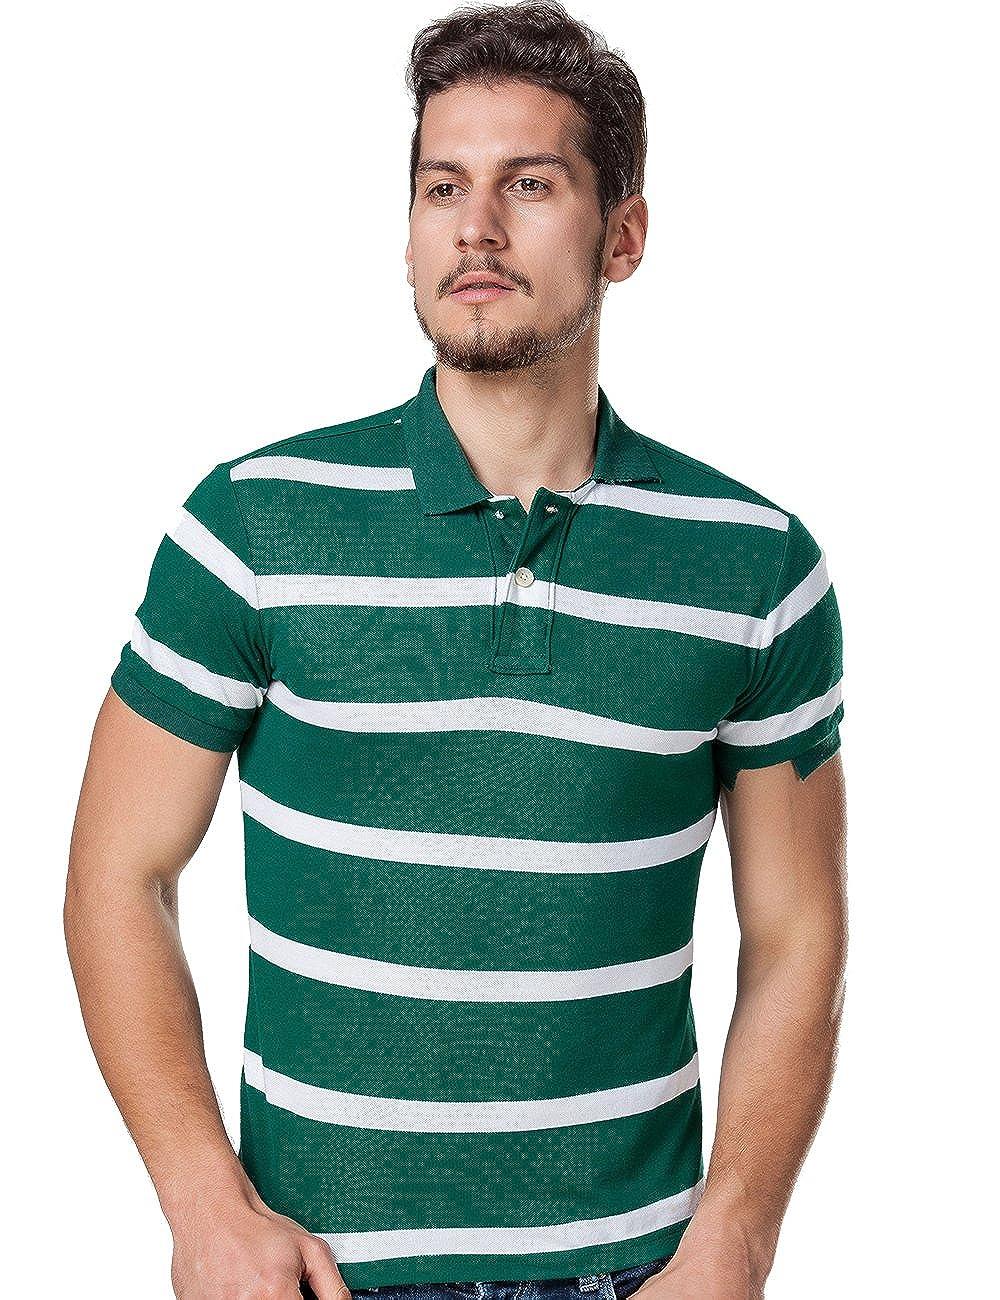 Dgglife Mens Polo Shirts Athletic Color Stripes Slim Fit Short